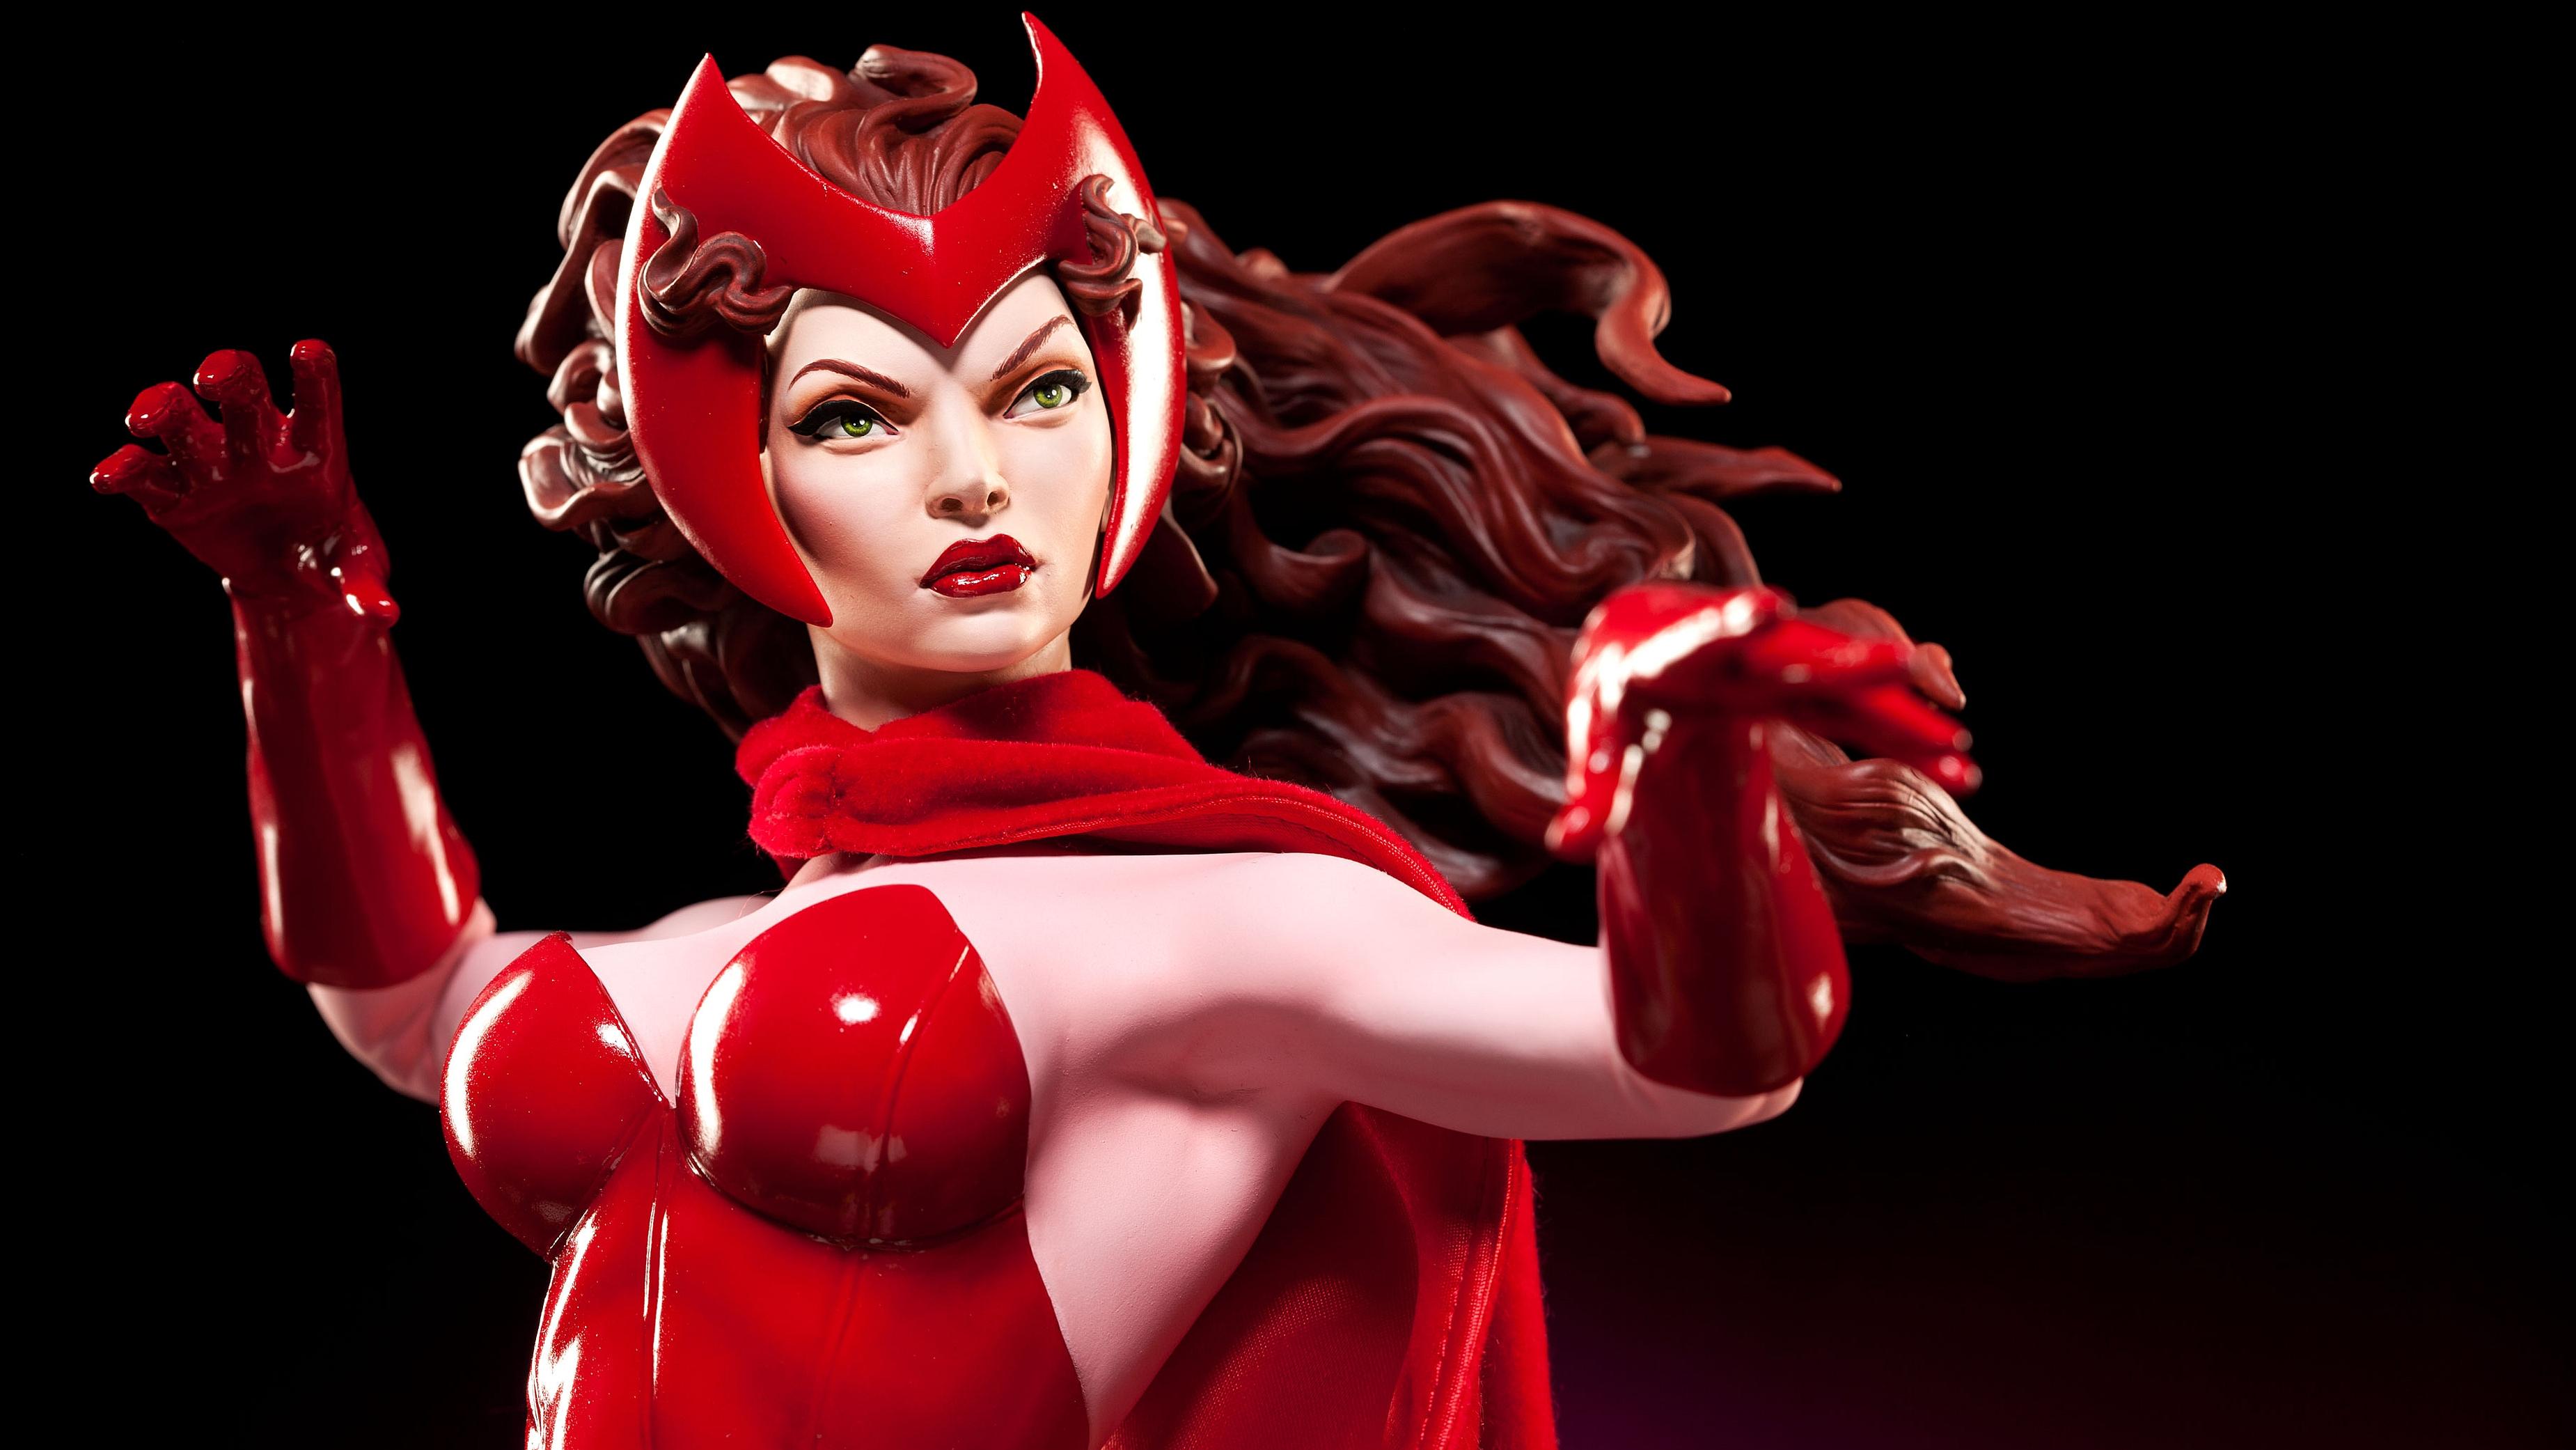 Great Wallpaper Marvel Scarlet Witch - scarlet_witch-16  Snapshot_134020.jpg